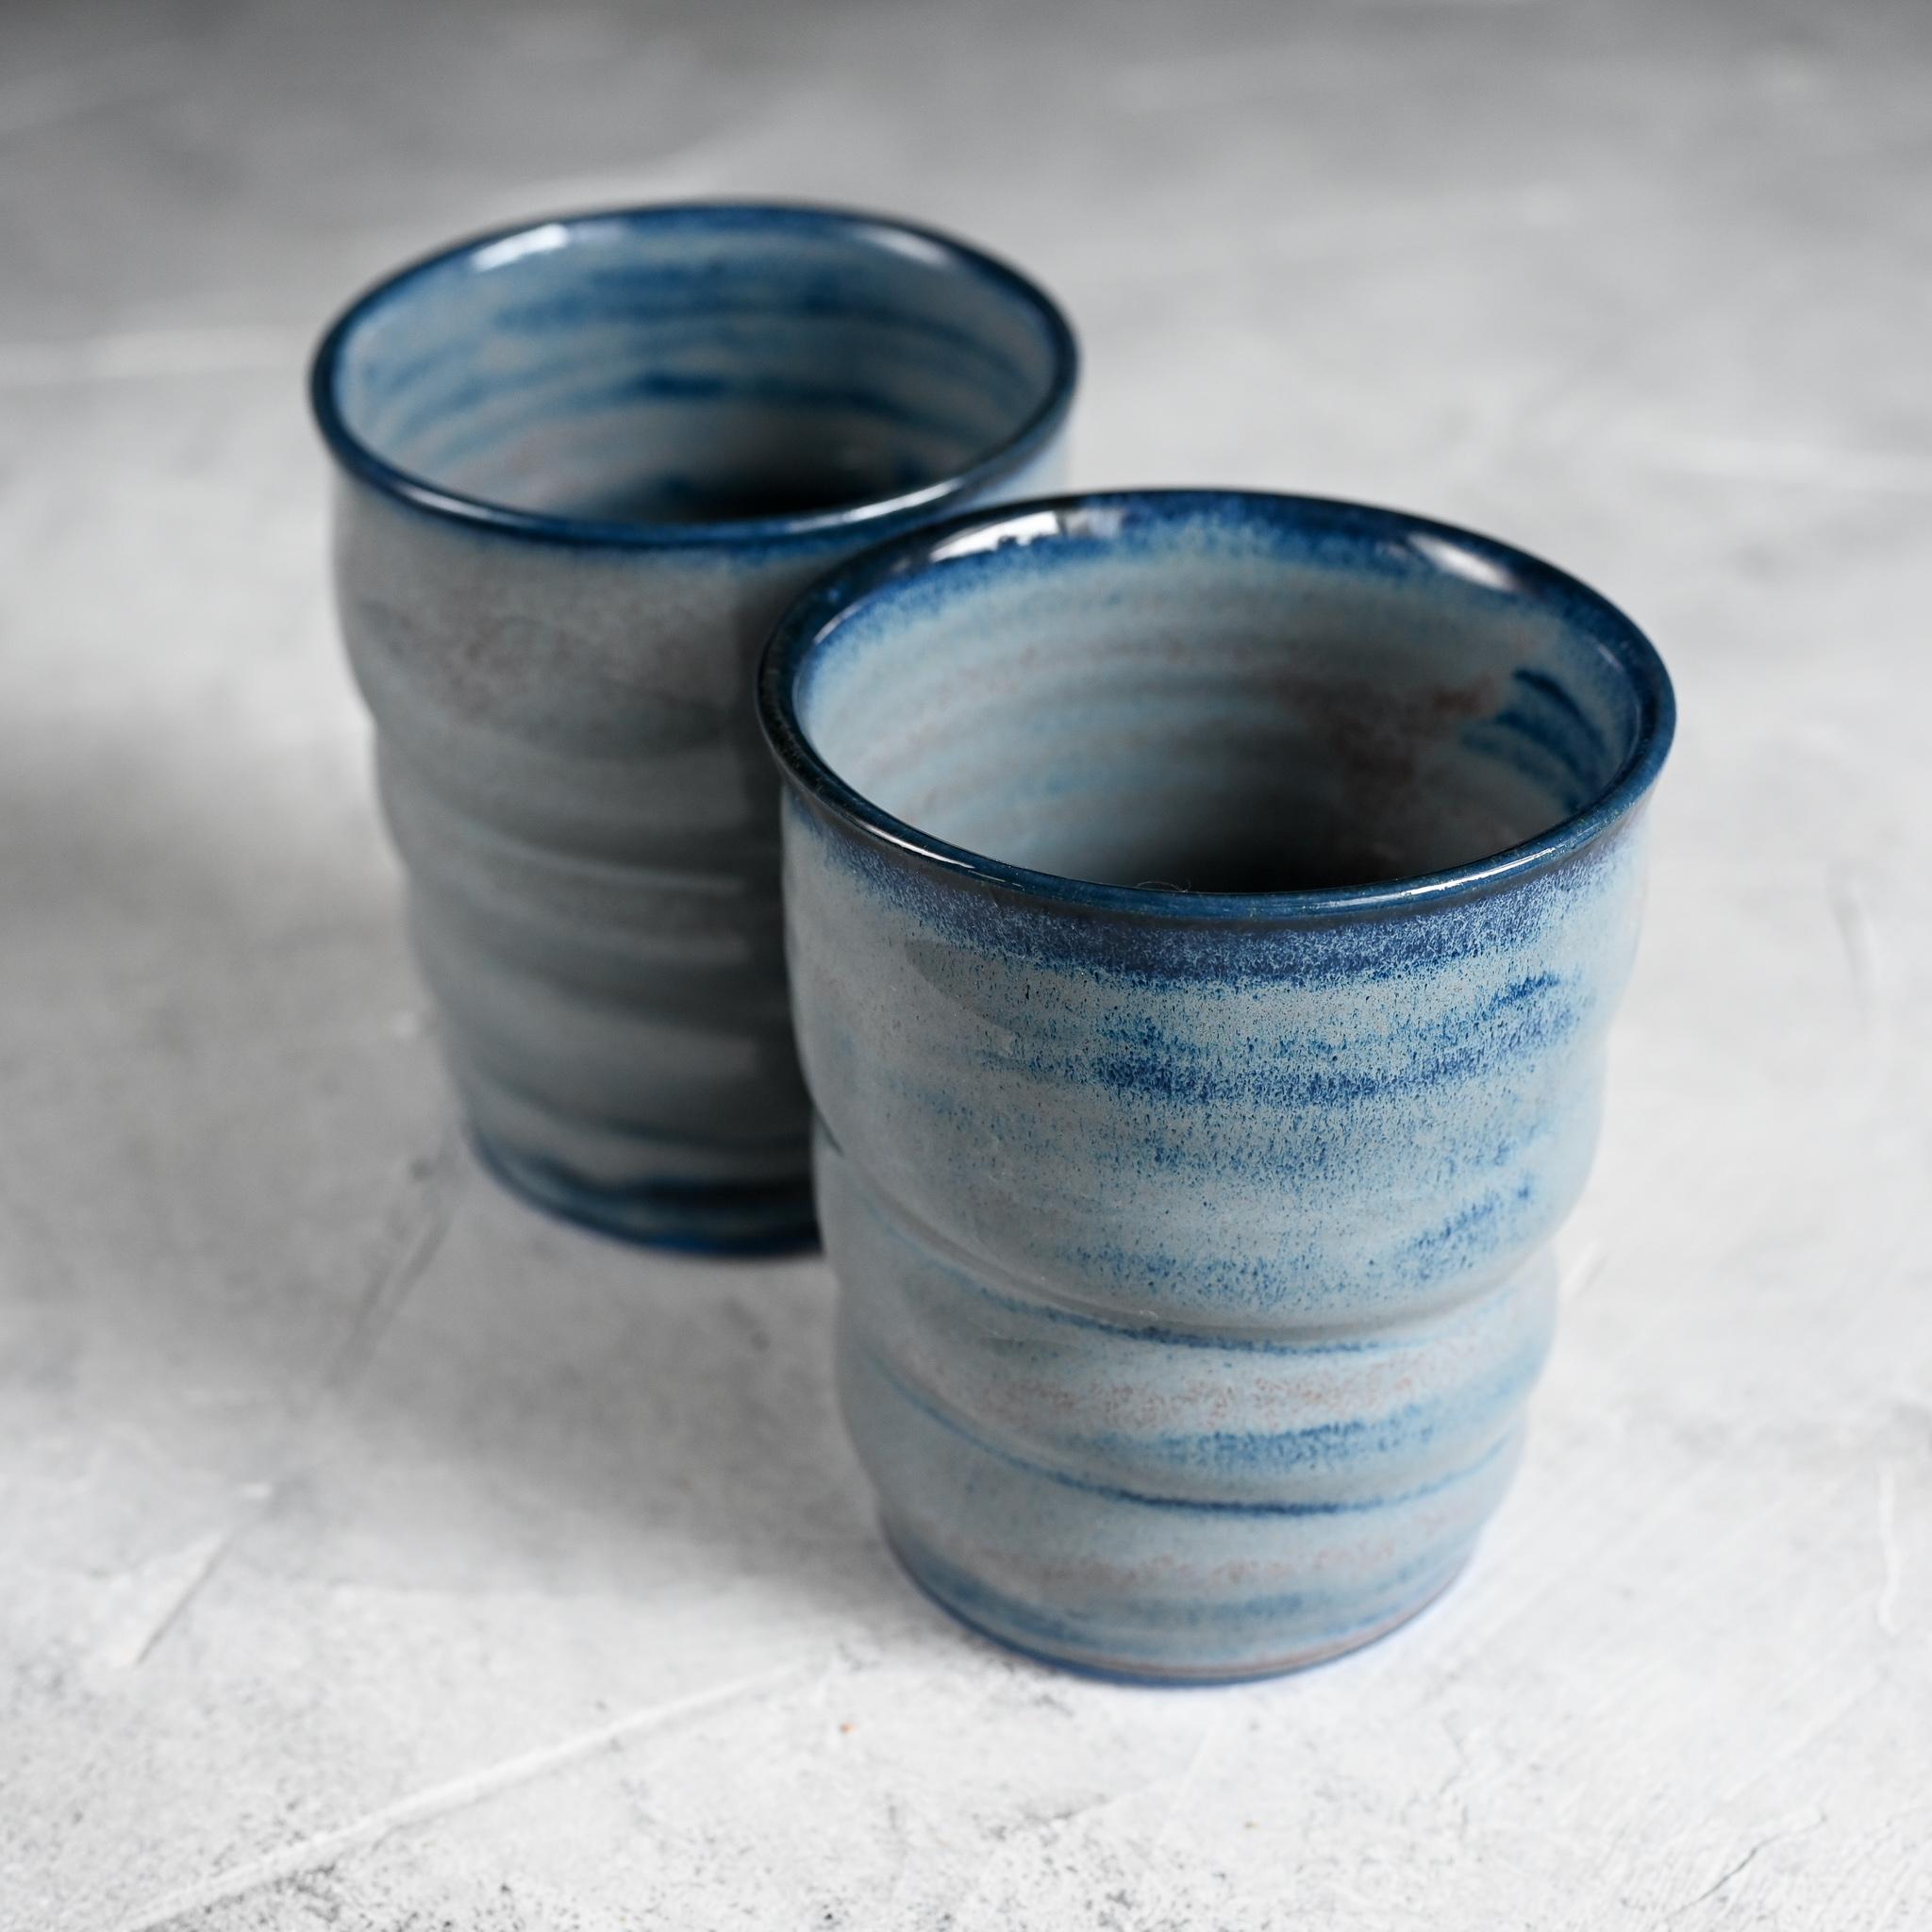 картинка Стакан из синего фарфора лиловый - DishWishes.Ru